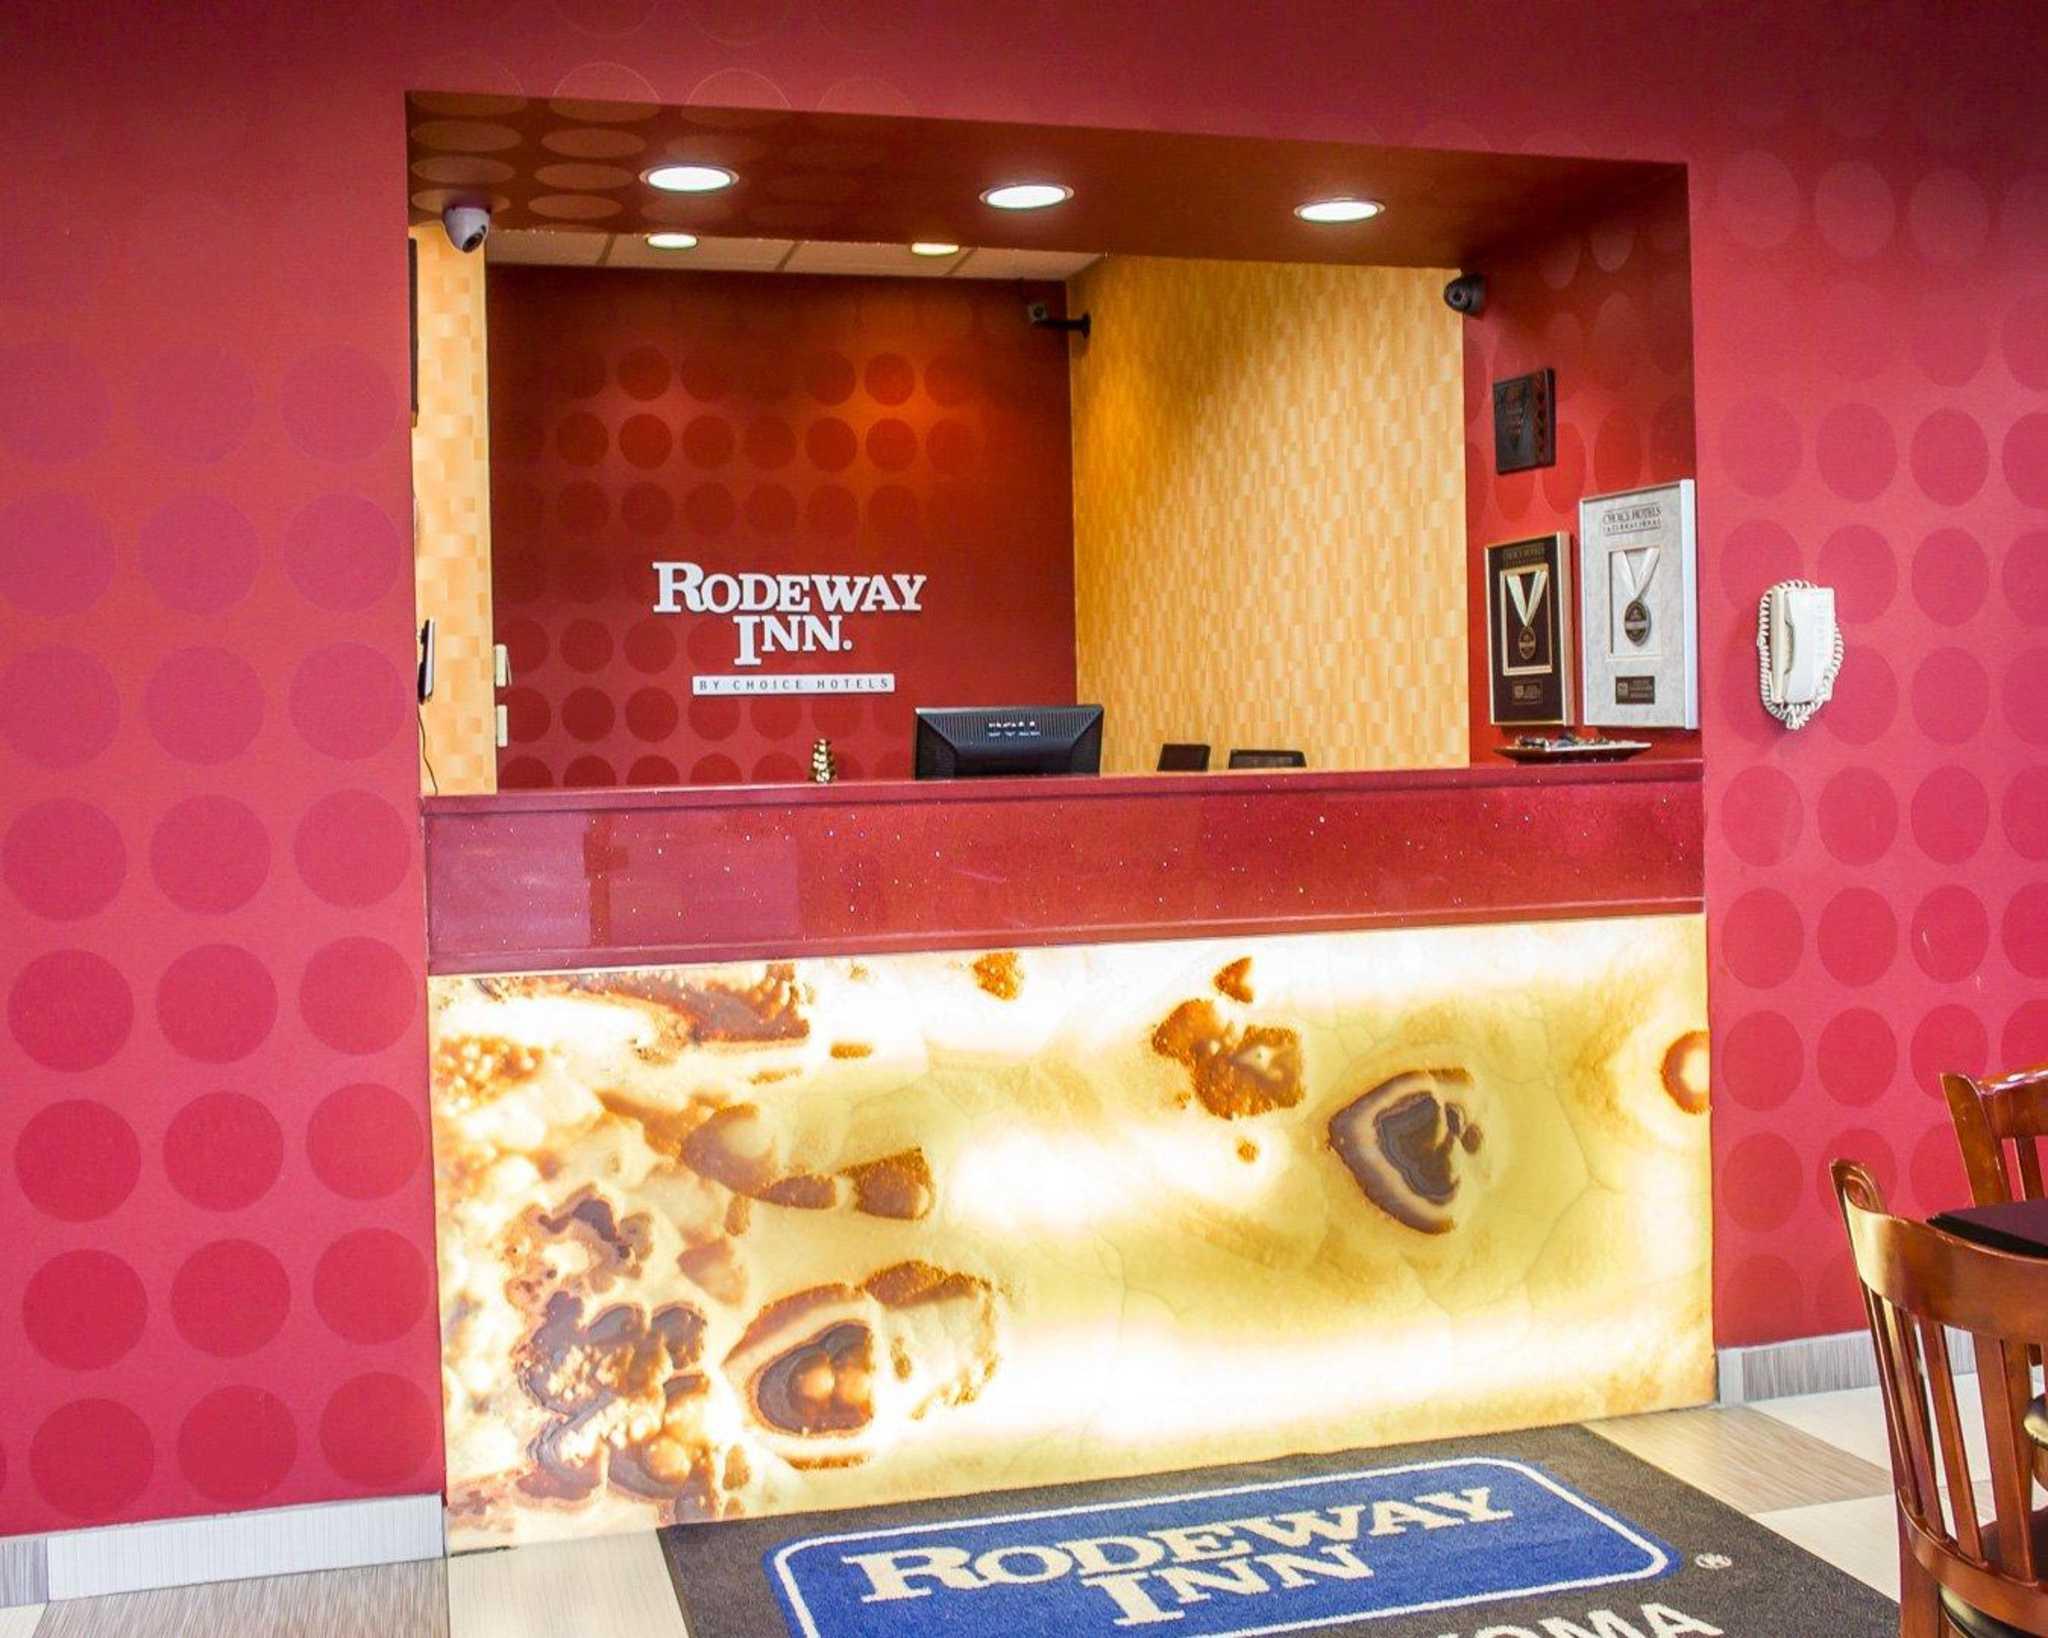 Rodeway Inn MacArthur Airport image 18